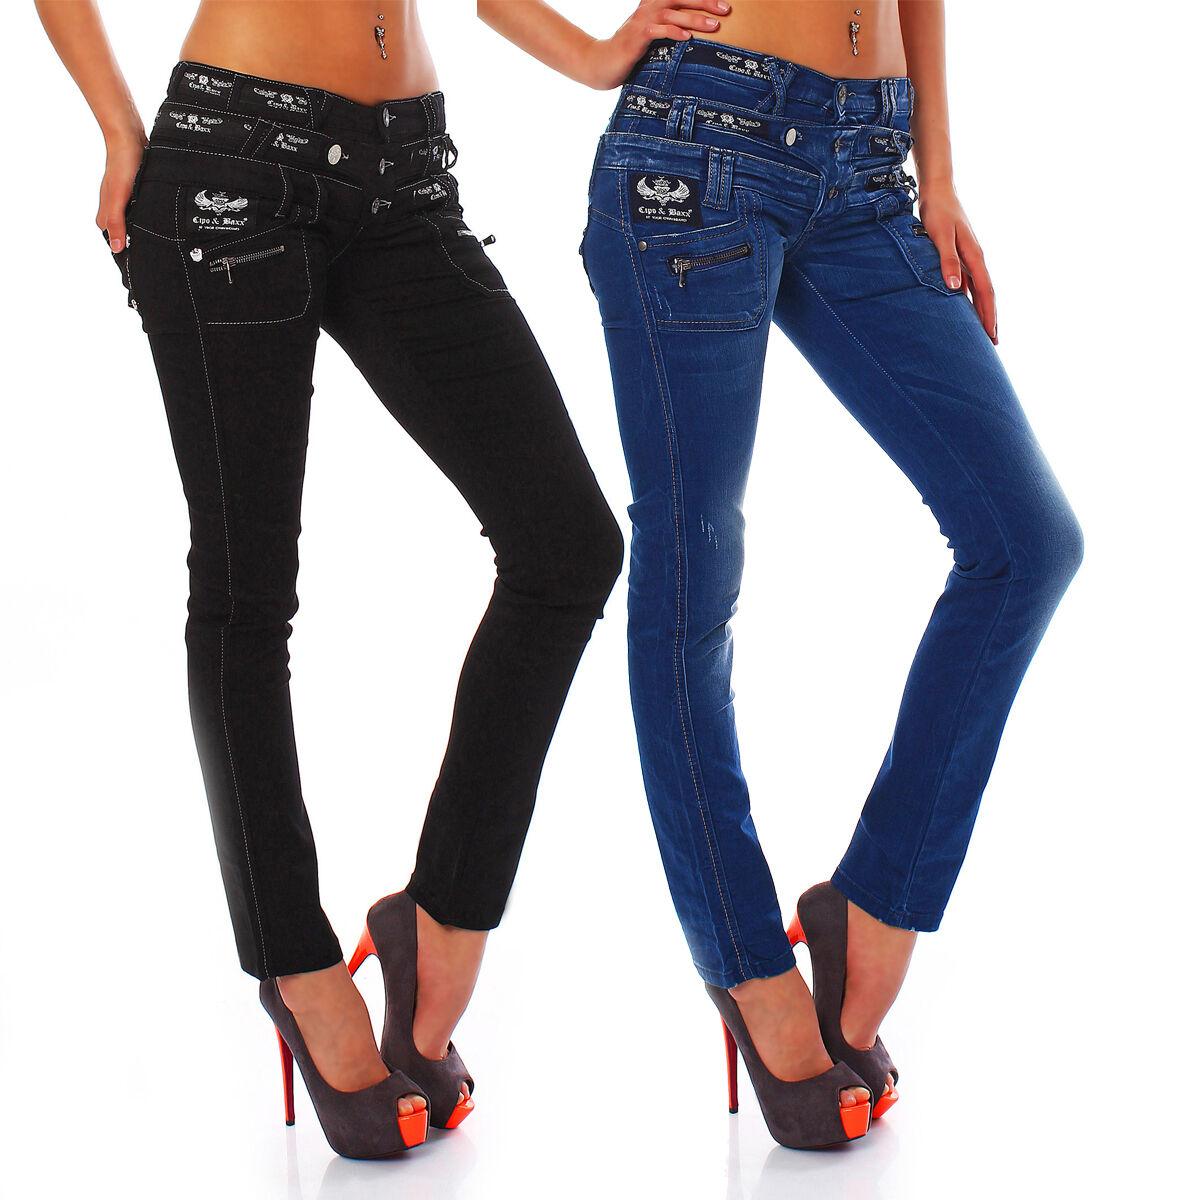 CIPO & BAXX - 2 Modelle - Damen Röhren Jeans Hose